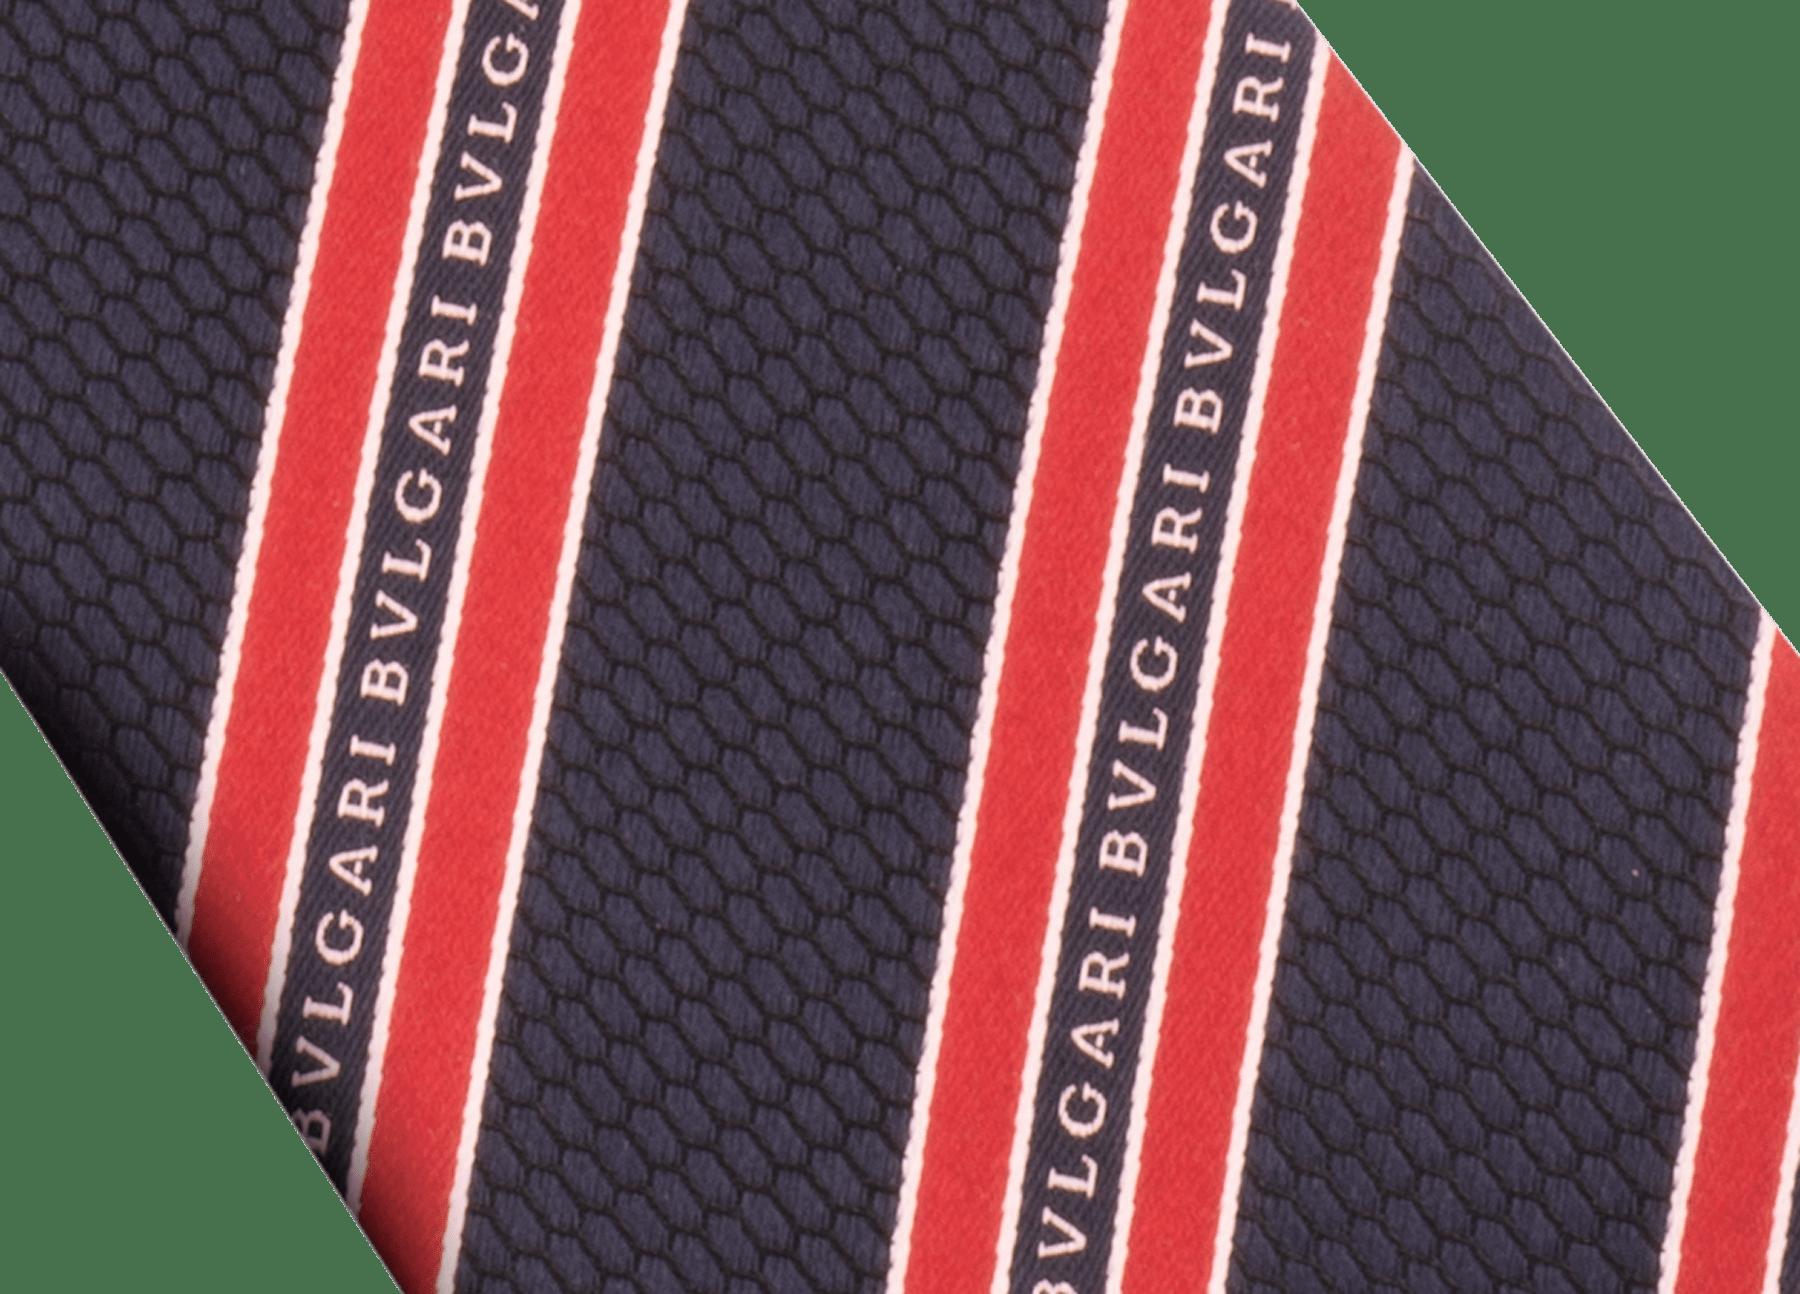 Pink RegiScales Logo pattern seven-fold tie in fine jacquard silk. LogoRegiScales image 2